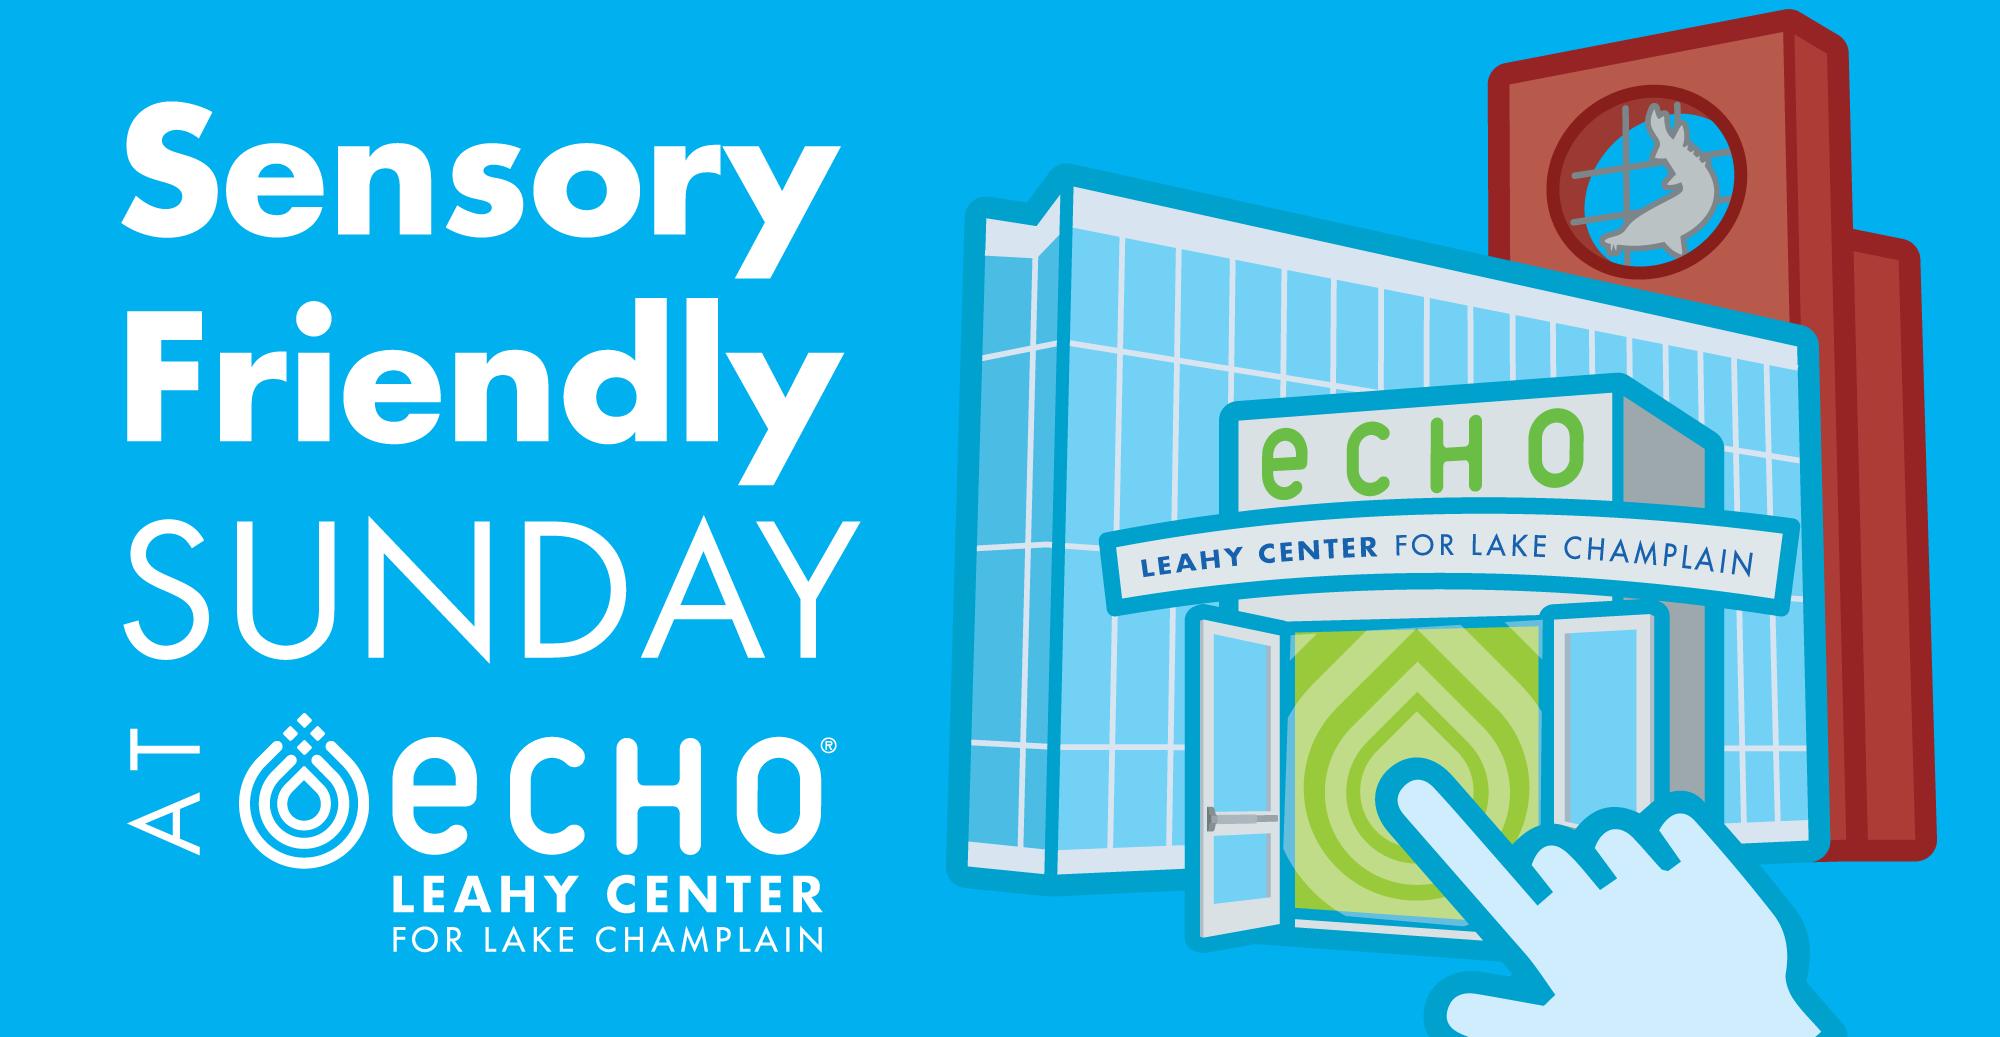 Sensory Friendly Sunday at ECHO